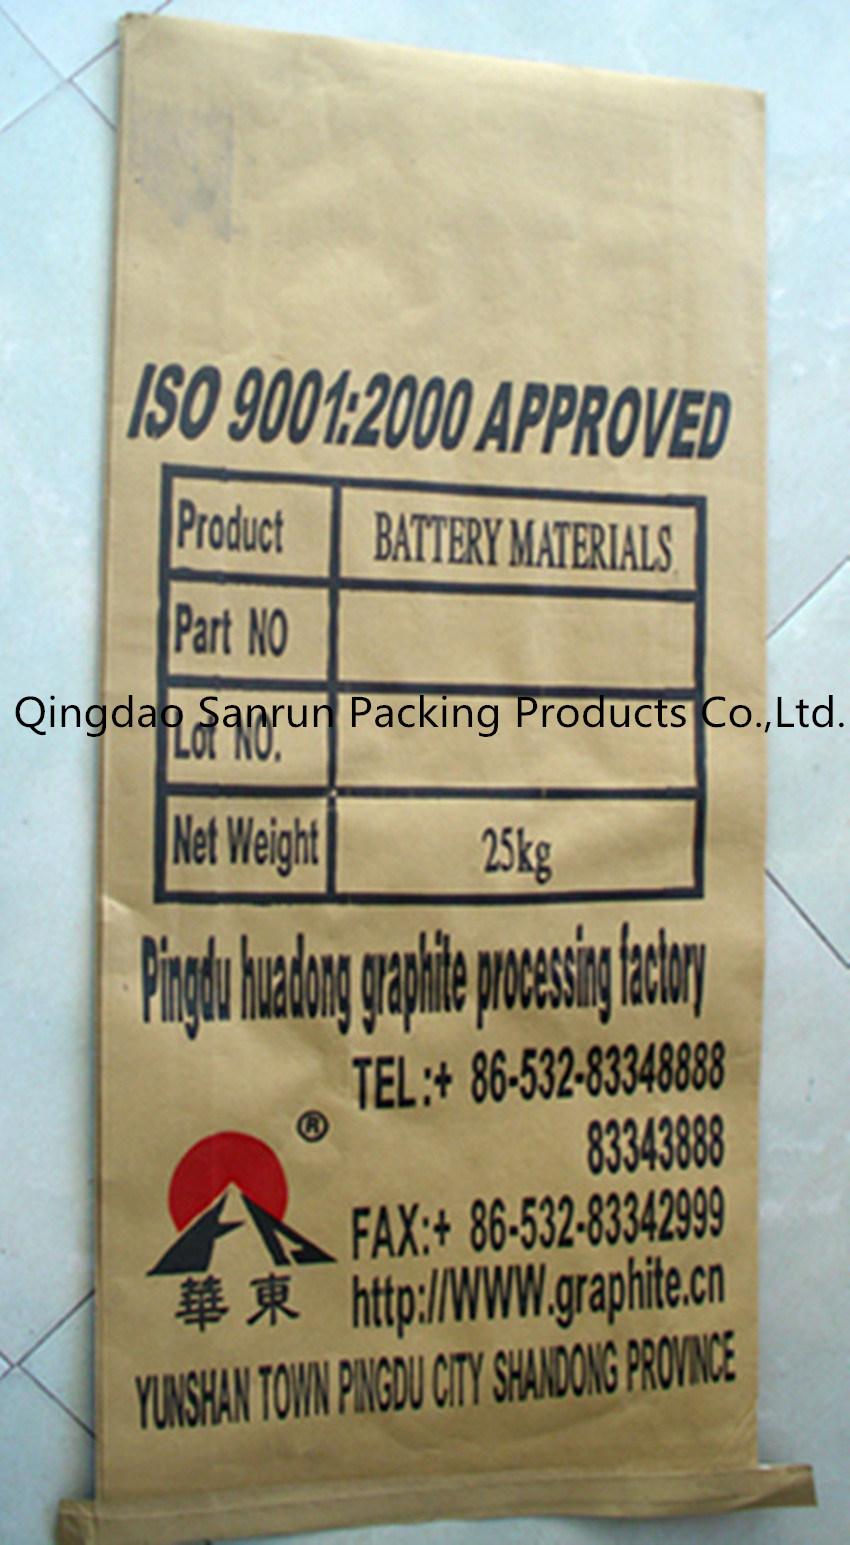 Graphite Powder Paper-Plastic PP Woven Bag